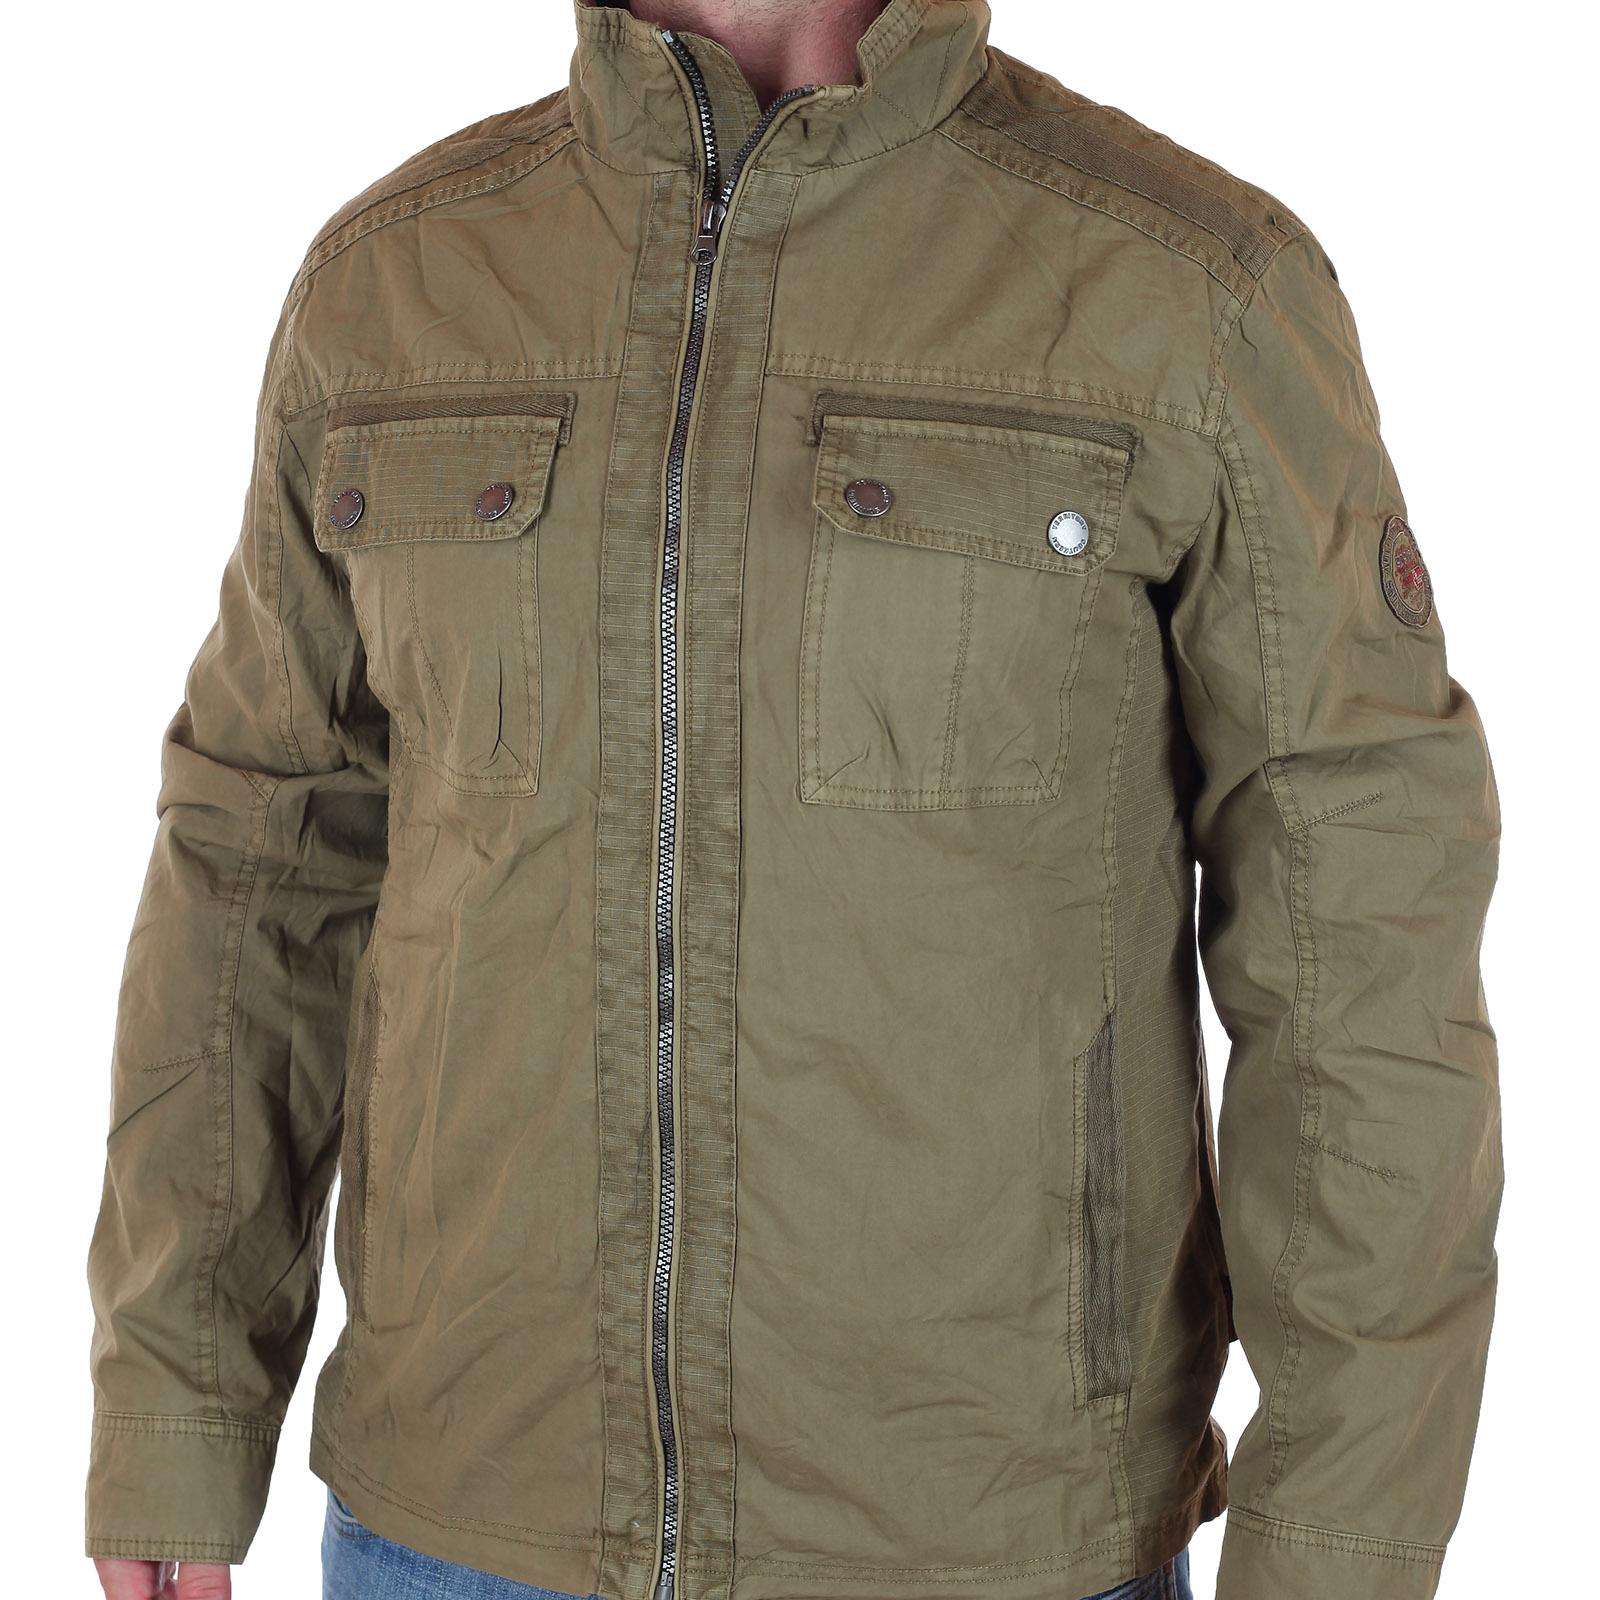 Демисезонная мужская куртка-парка Southern Territory